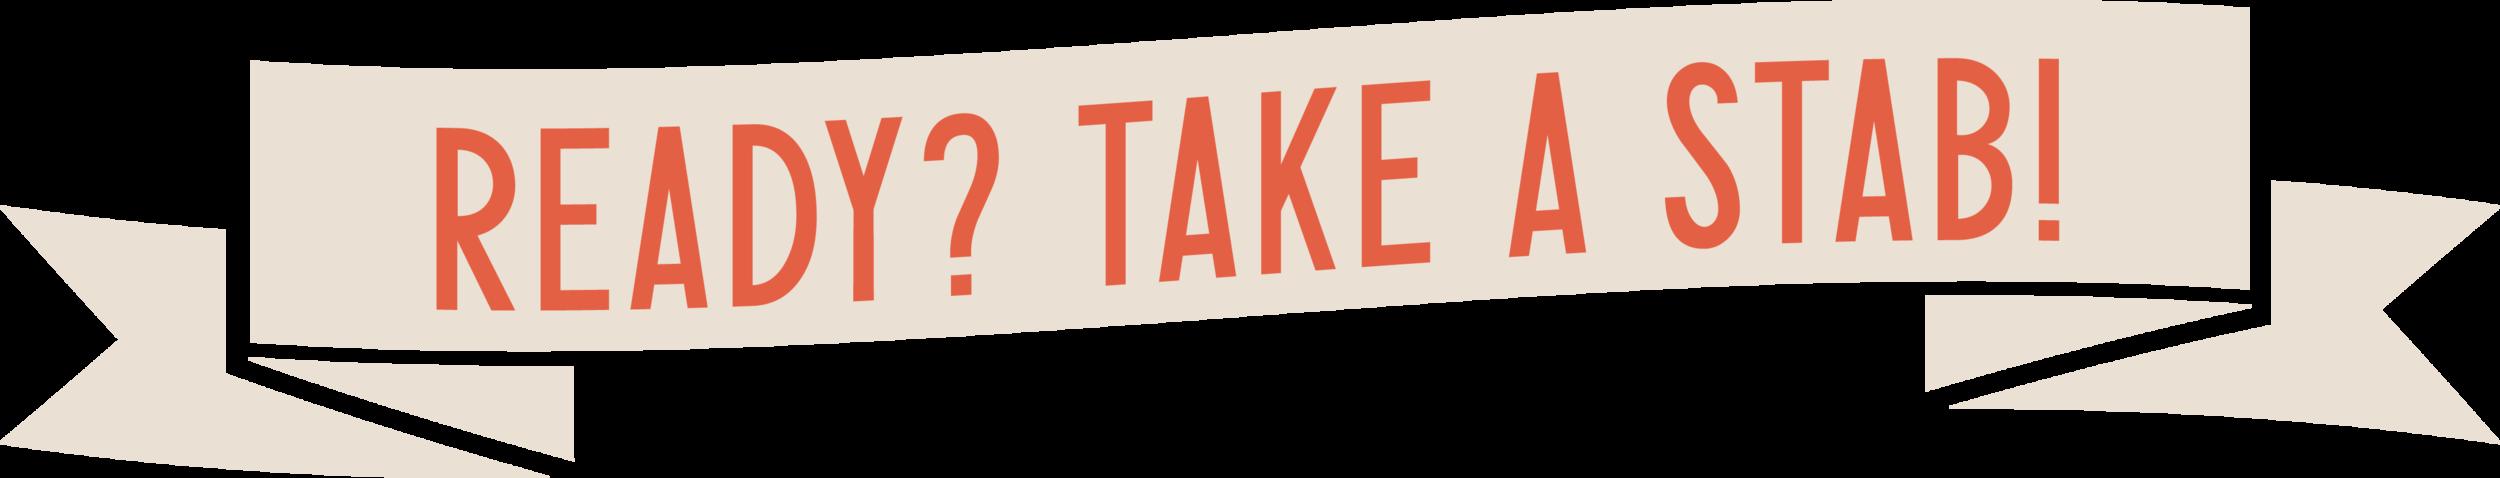 TAKEASTAB.png